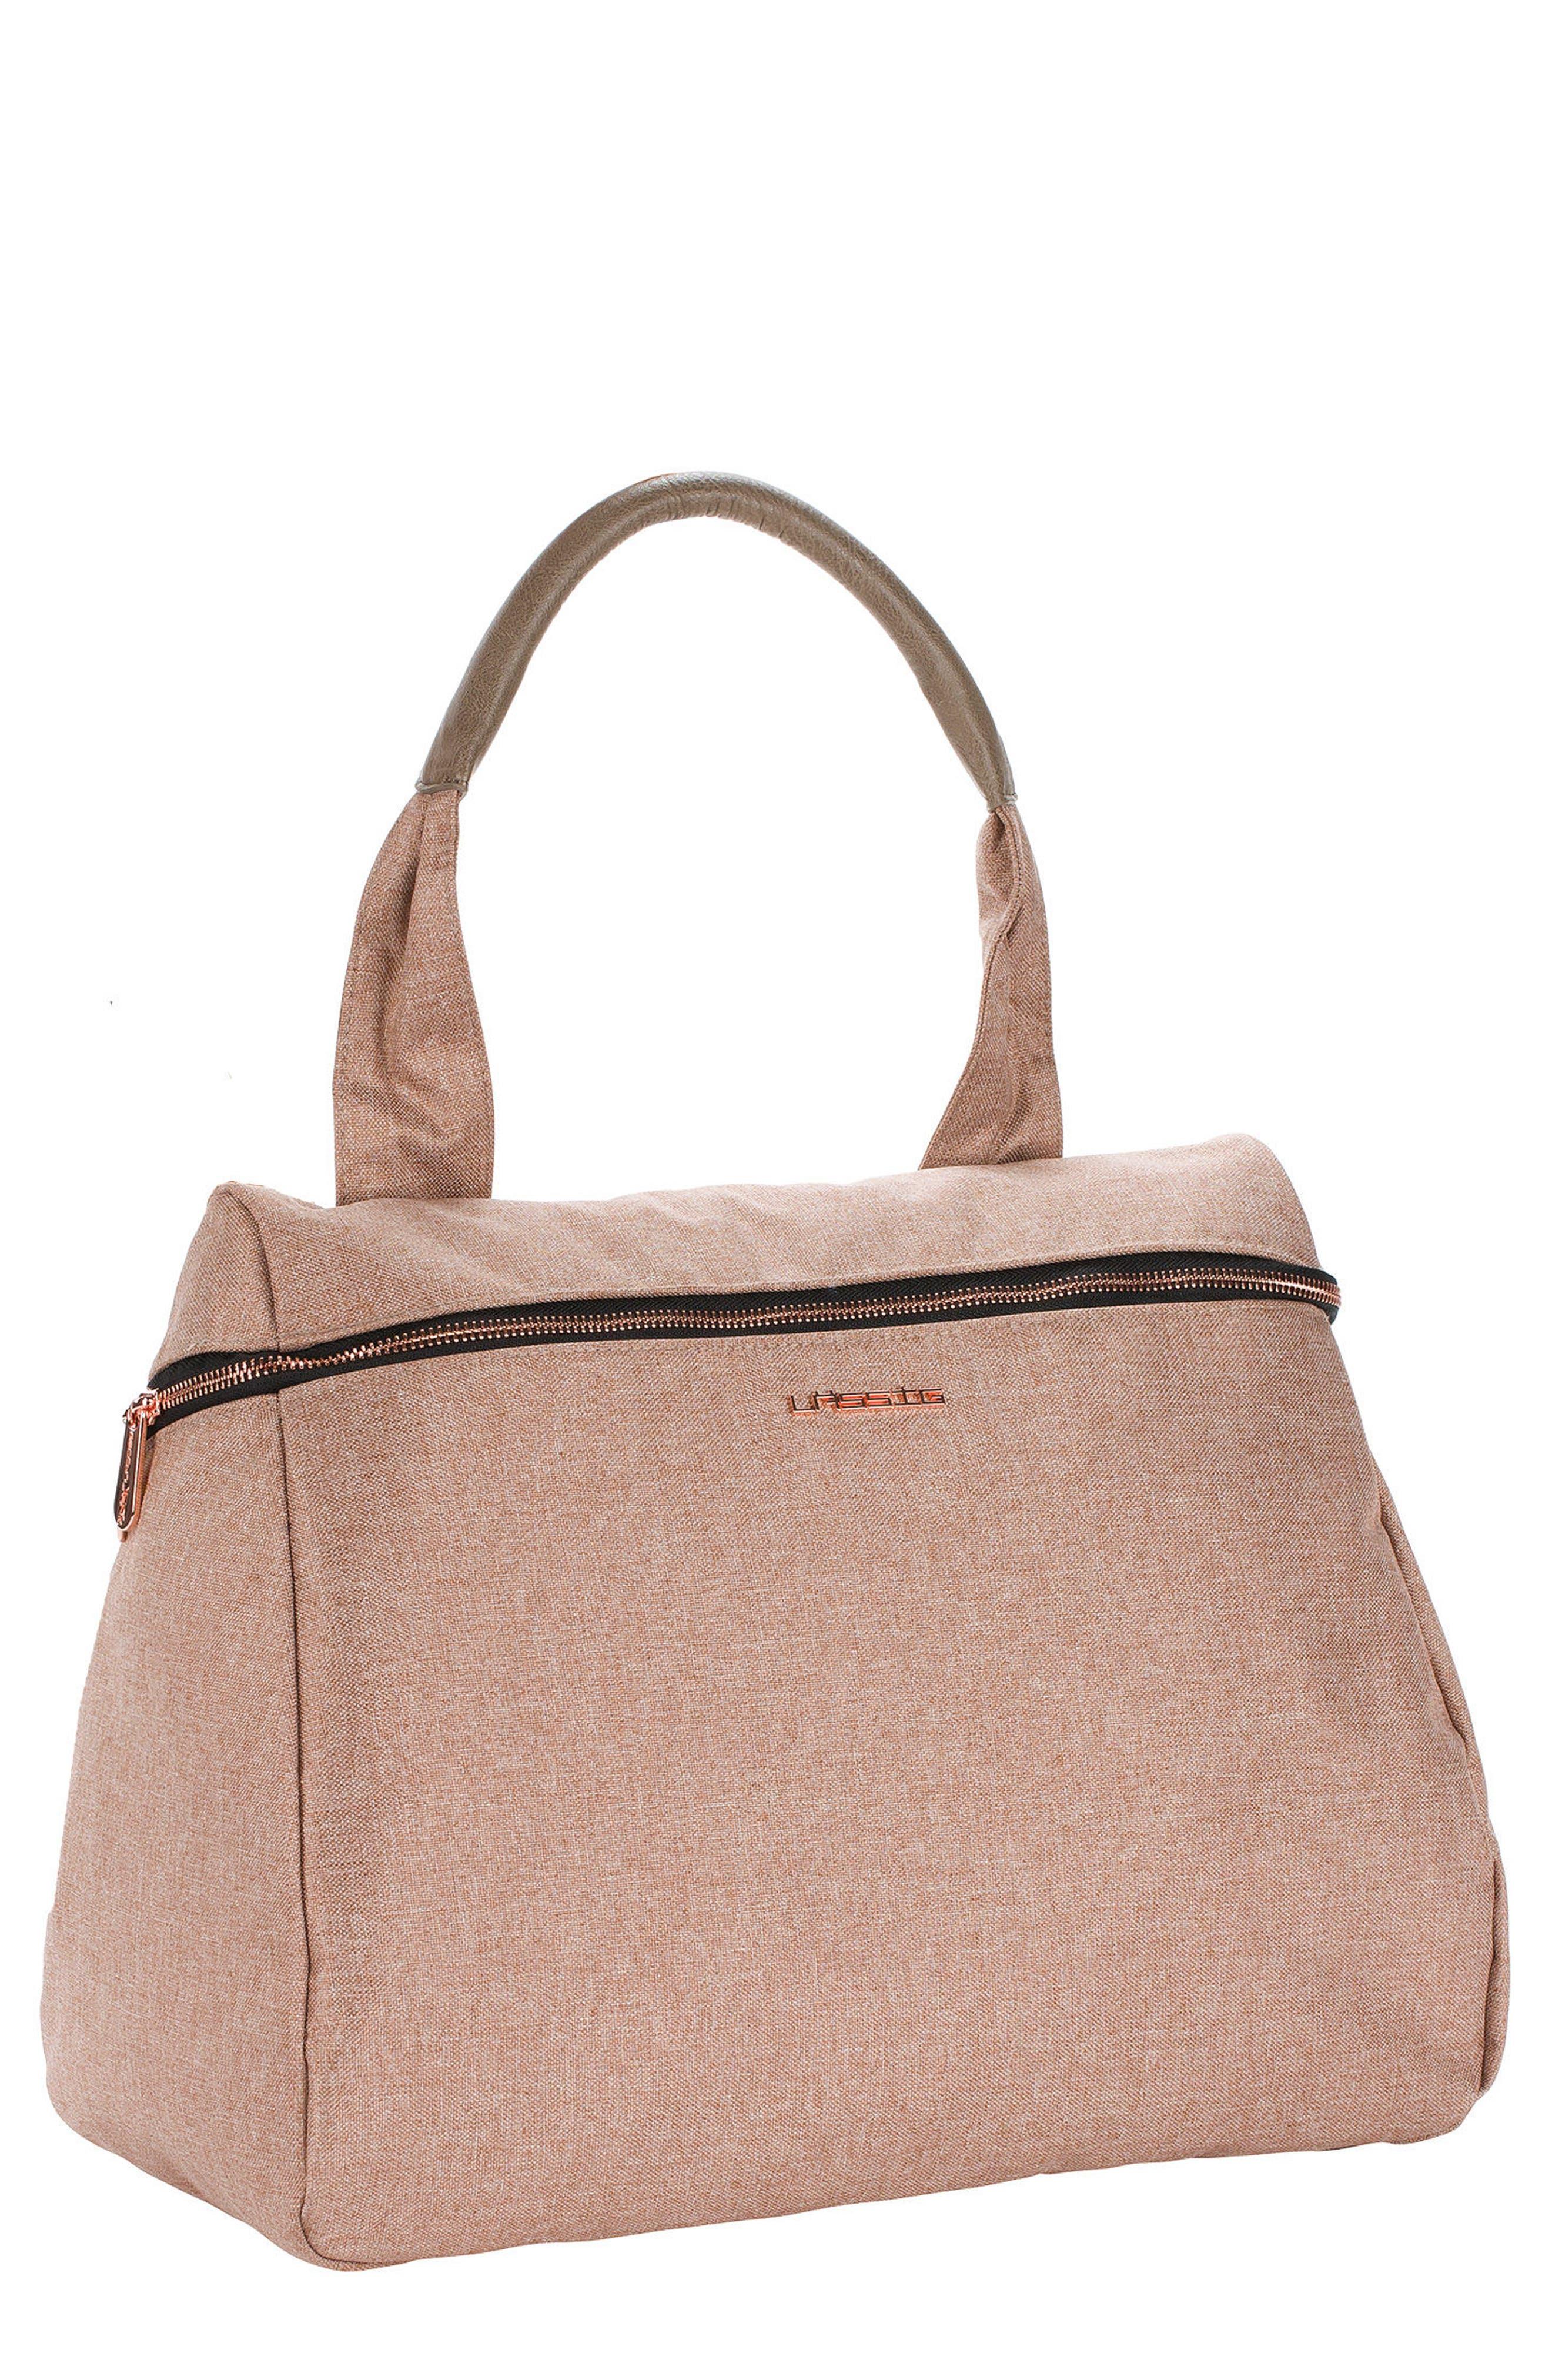 Main Image - Lässig Glam Rosie Diaper Bag